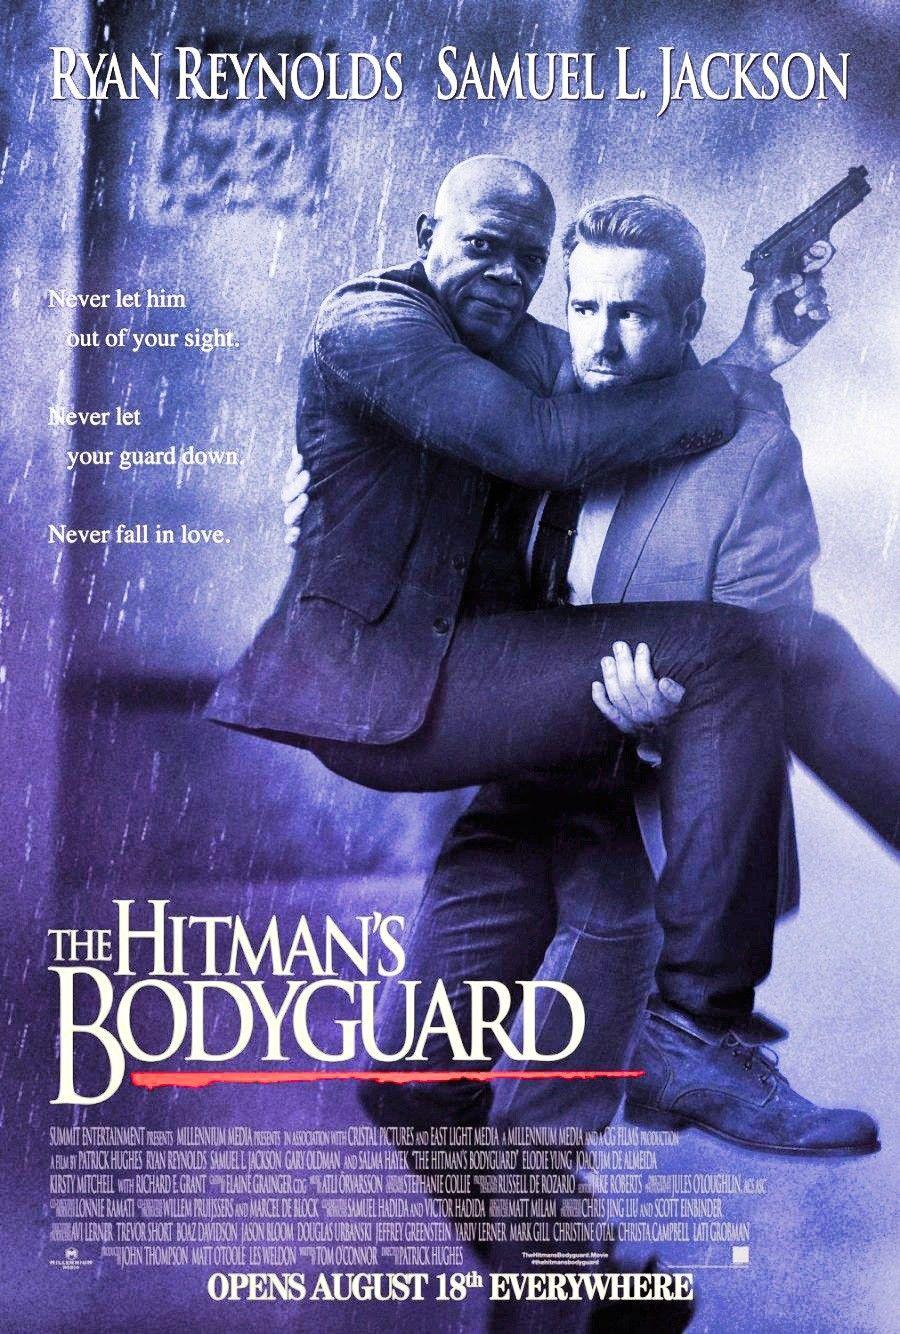 The Hitmans Bodyguard Movie Poster Ryan Reynolds 1080p Cartazes